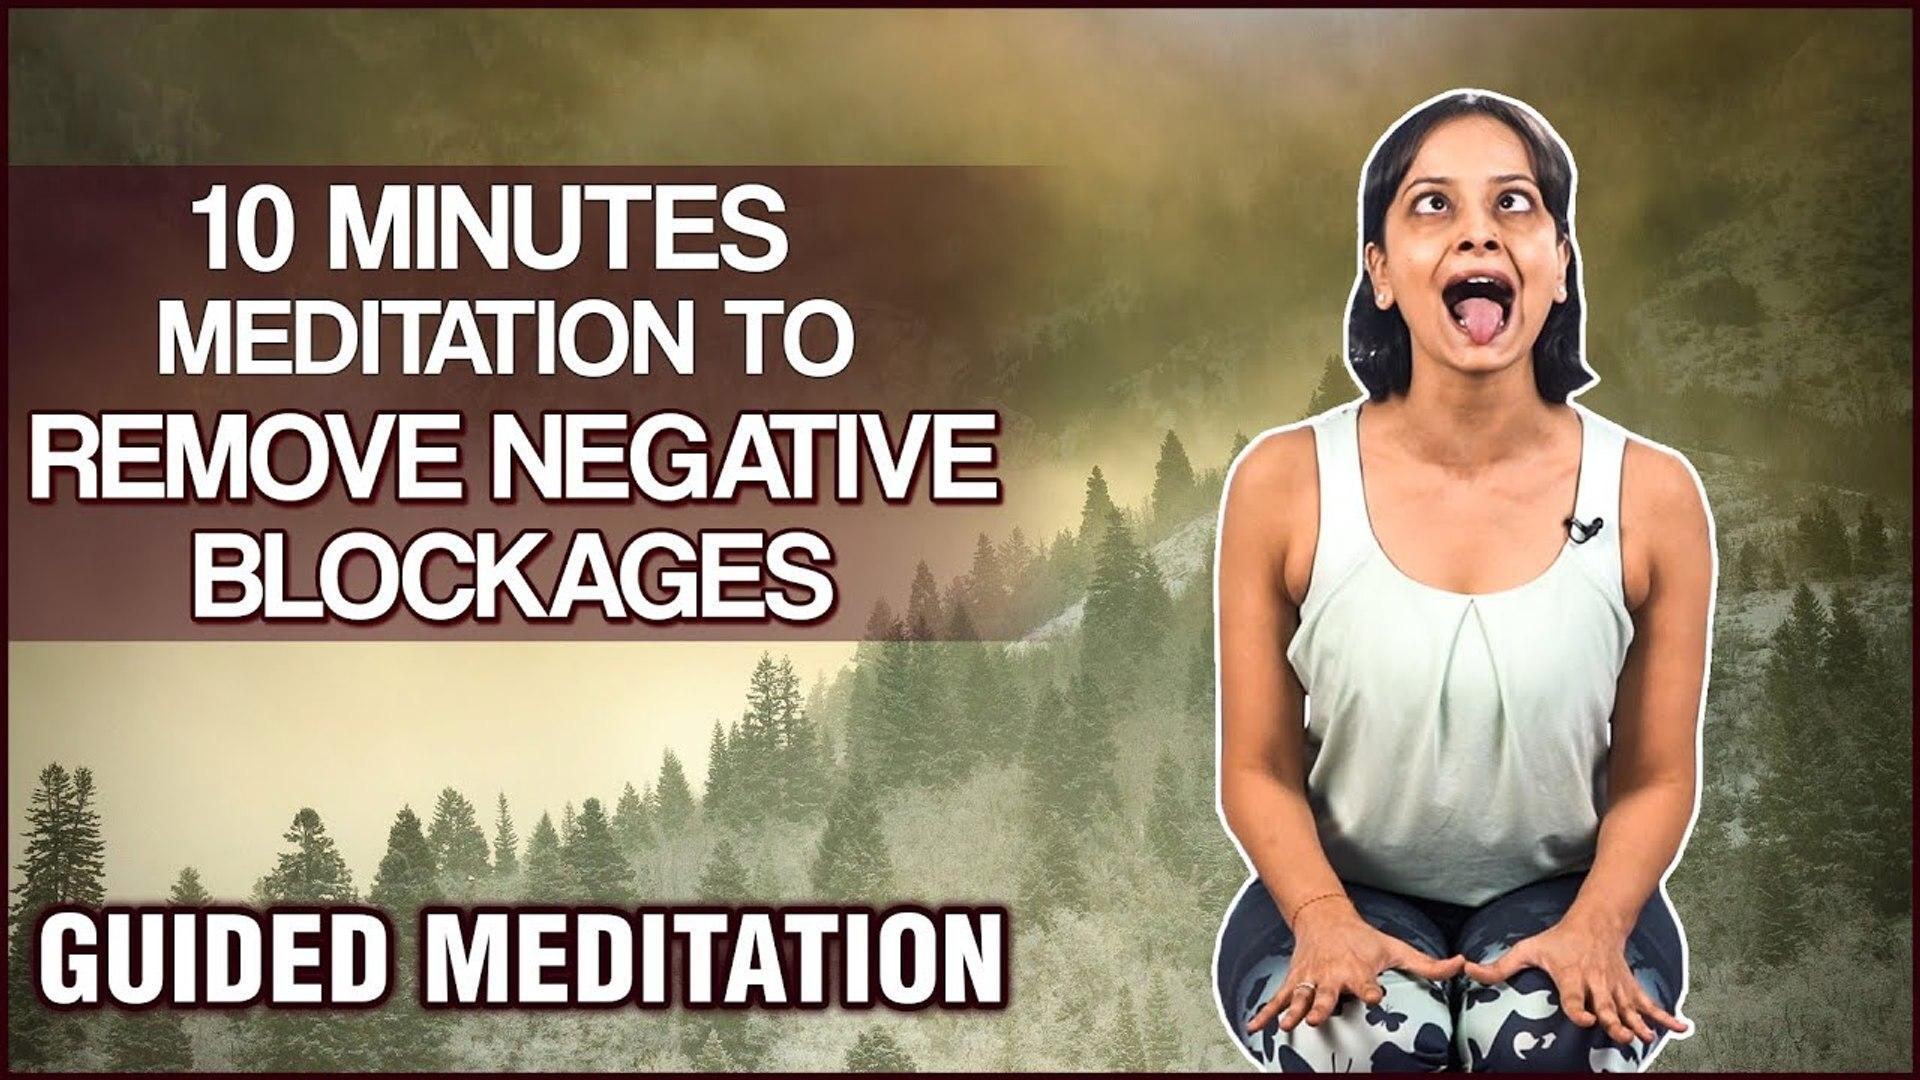 10 Minutes Meditation To Remove Negative Blockages|Remove Mental Blockages  & Subconscious Negativity